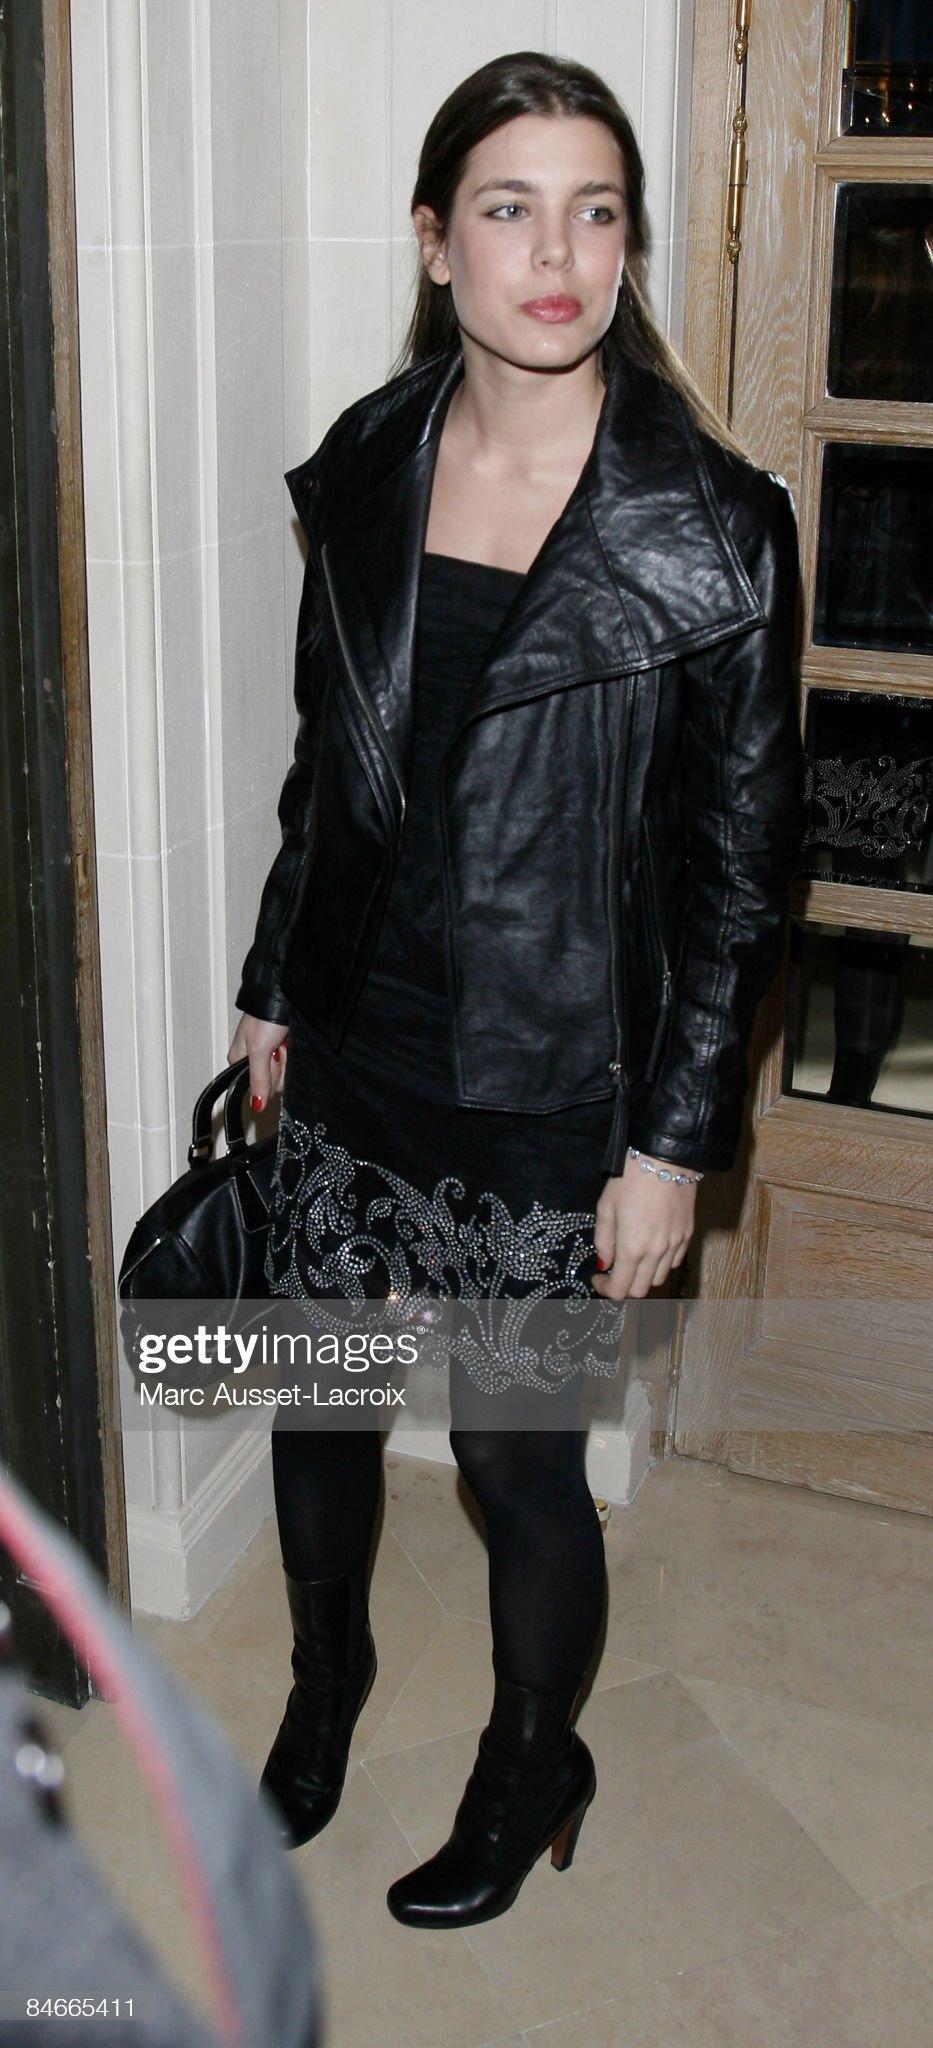 Etam Party and Fashion Show with Natalia Vodianova : News Photo